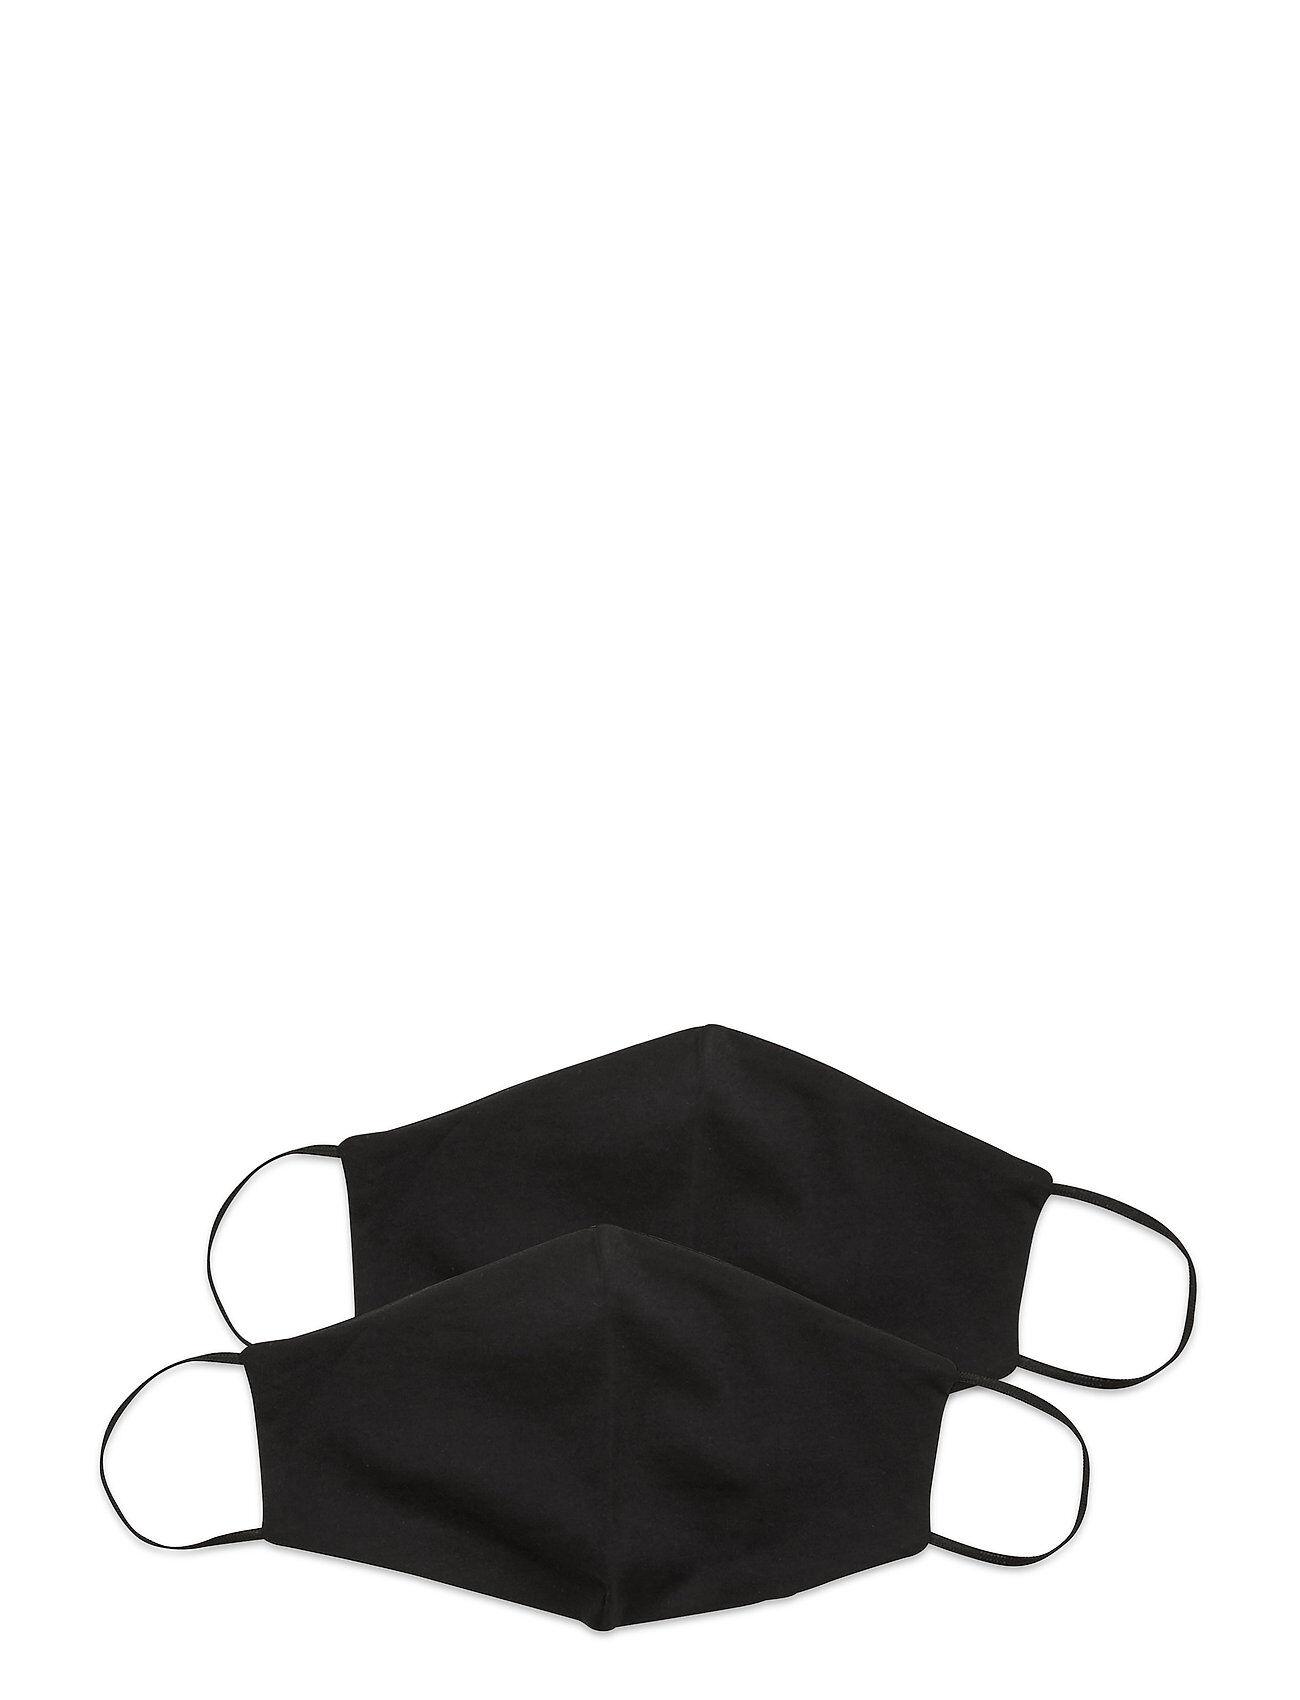 ORAS24 Reusable Face Mask,2 Pack, Kids 2-10 Accessories Face Masks Musta ORAS24